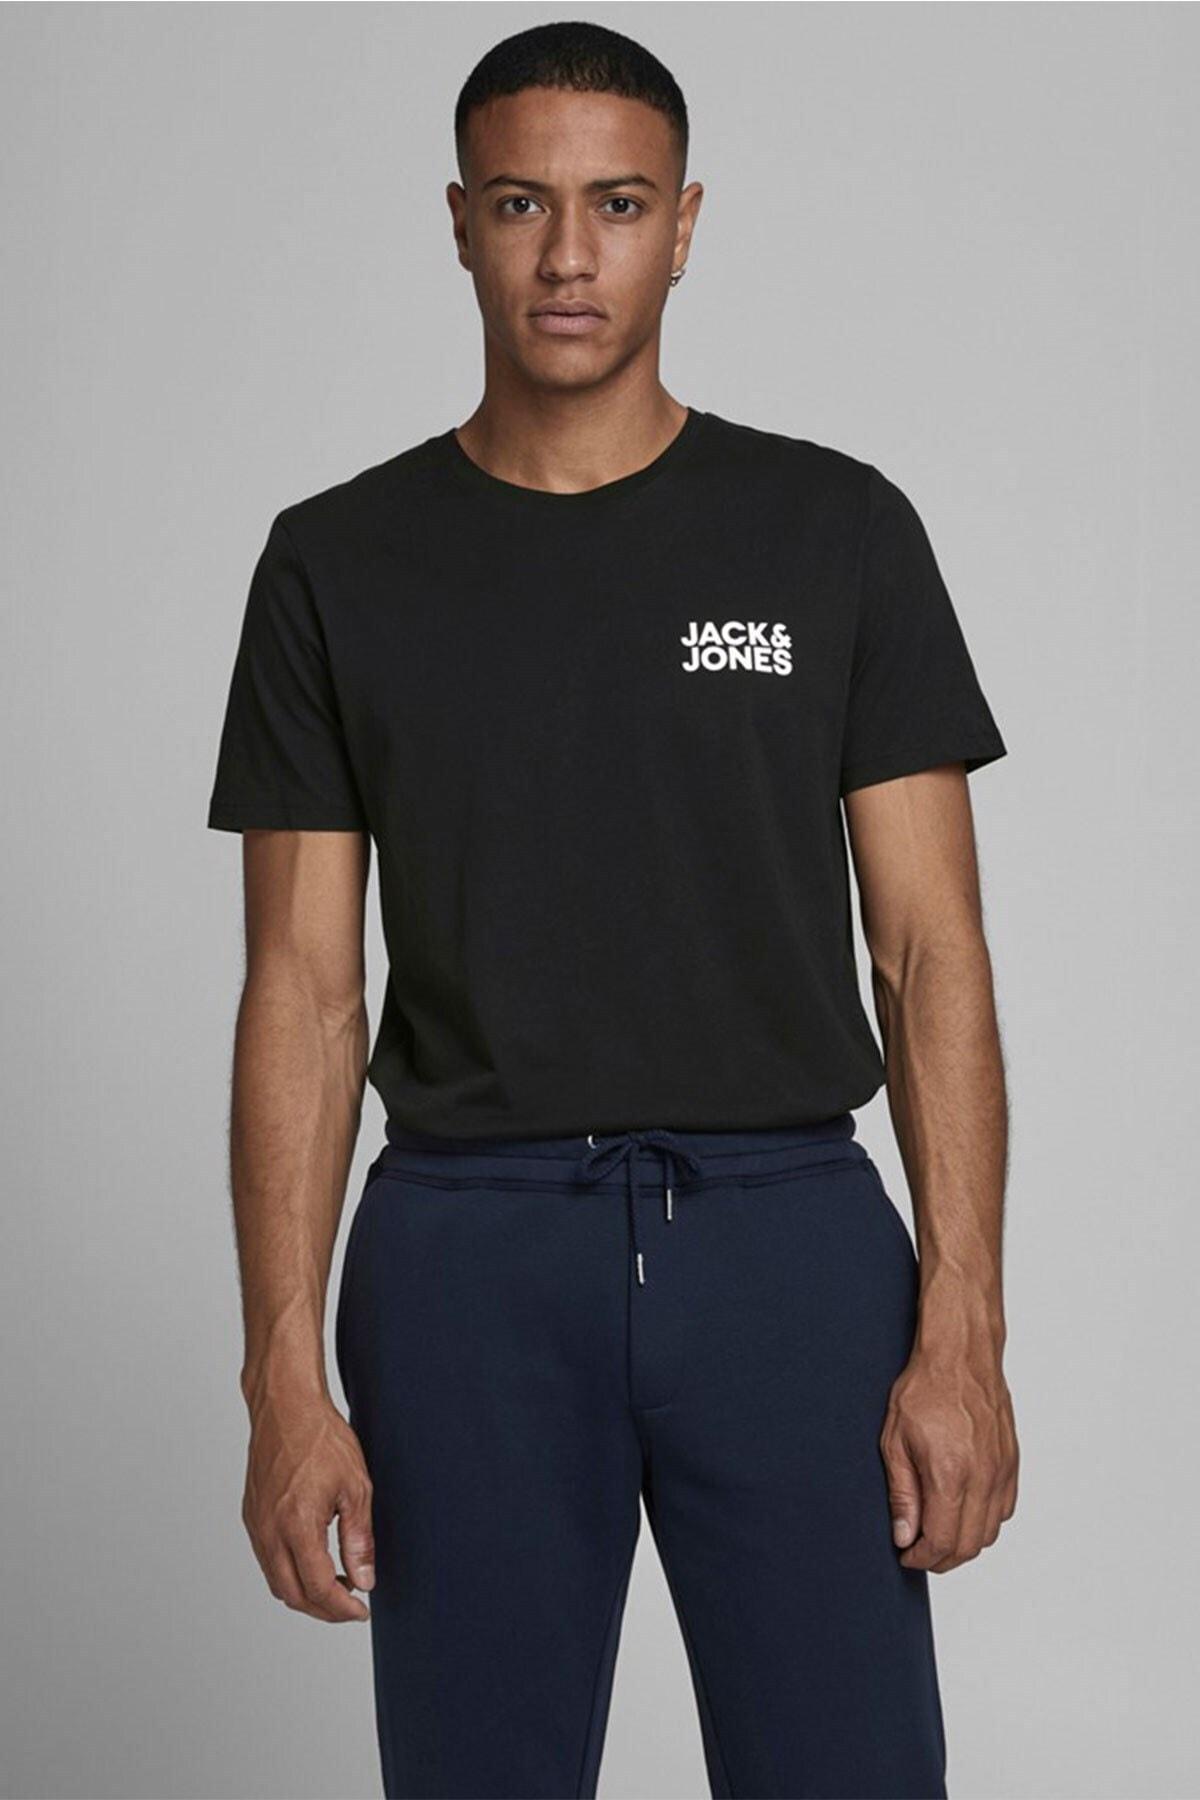 Jack & Jones Jack&jones Essentıals Erkek T-shirt Black 1